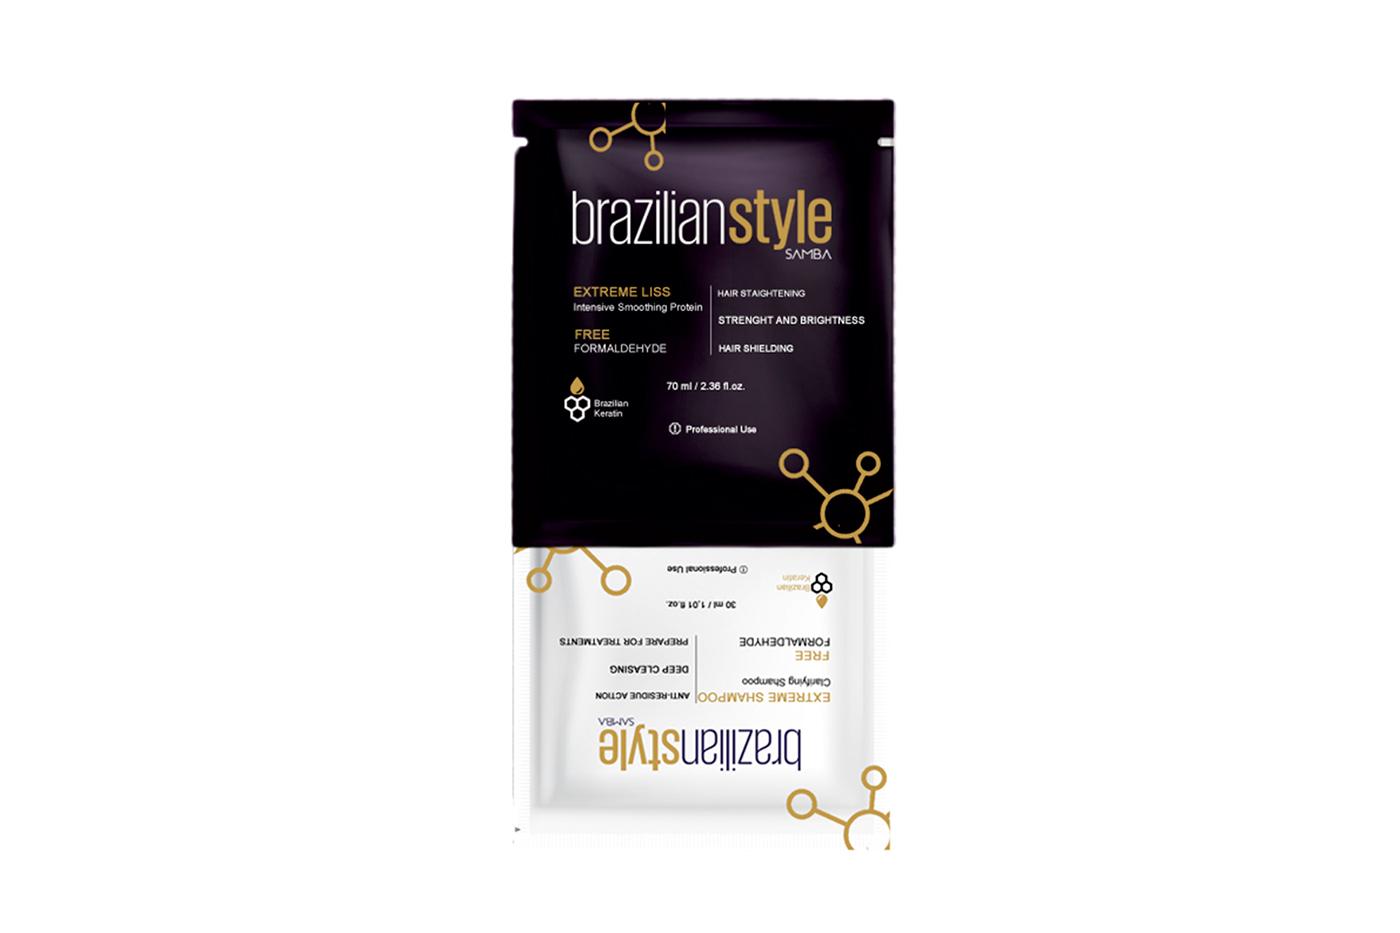 Brazilian Style Samba introduces products for keratin treatments